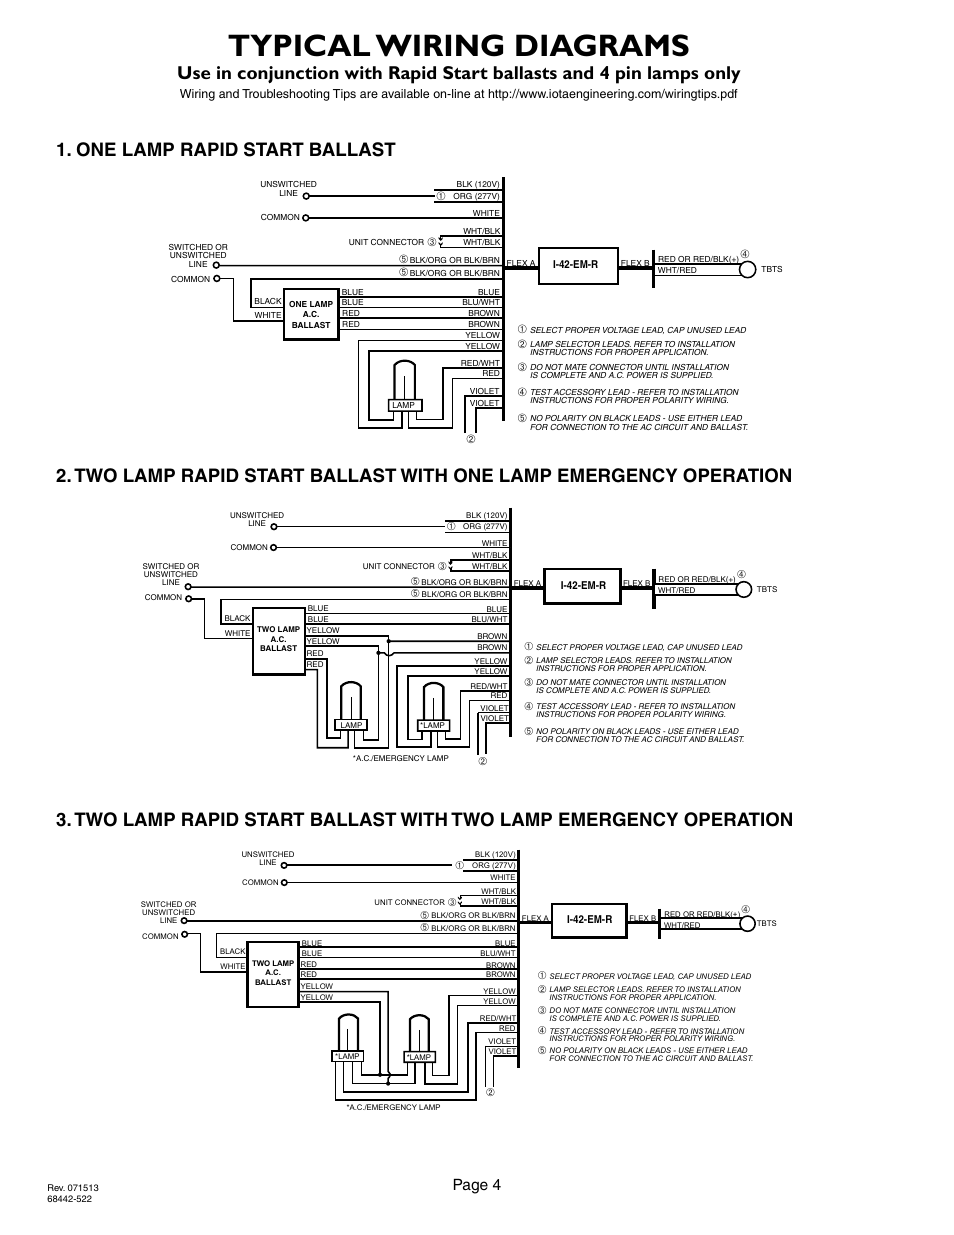 medium resolution of  4 lamps wiring diagram rapid start ballast iota i32 emergency ballast wiring diagram rapid start ballast wiring diagram on advance ballast diagram